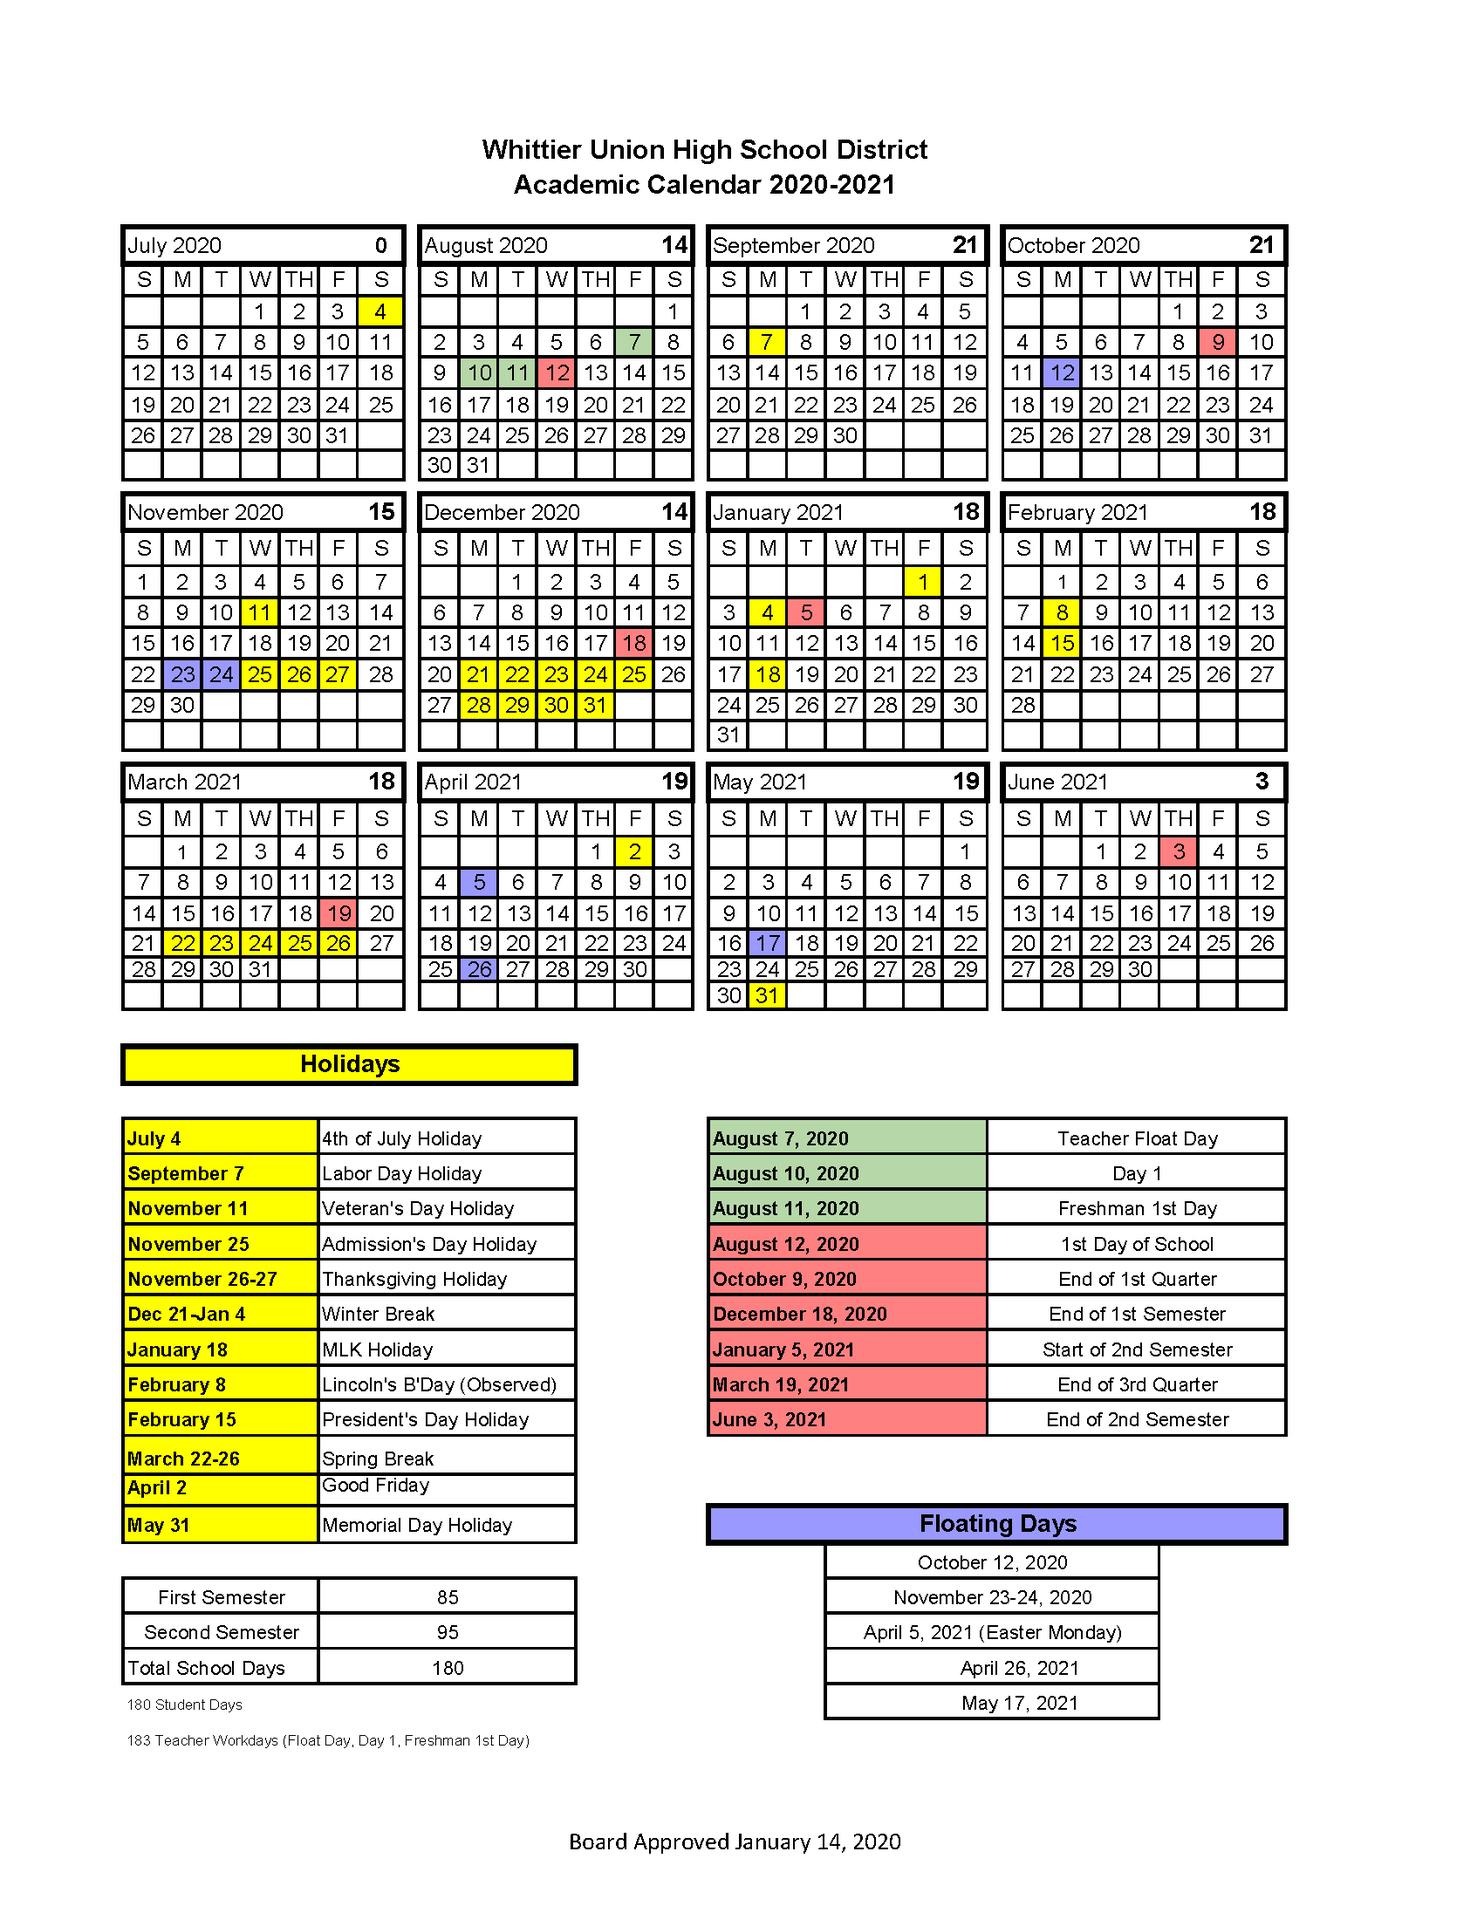 Wuhsd Academic Calendars – District Information – Whittier pertaining to West Orange School District Printale Academic Schoool Schedule